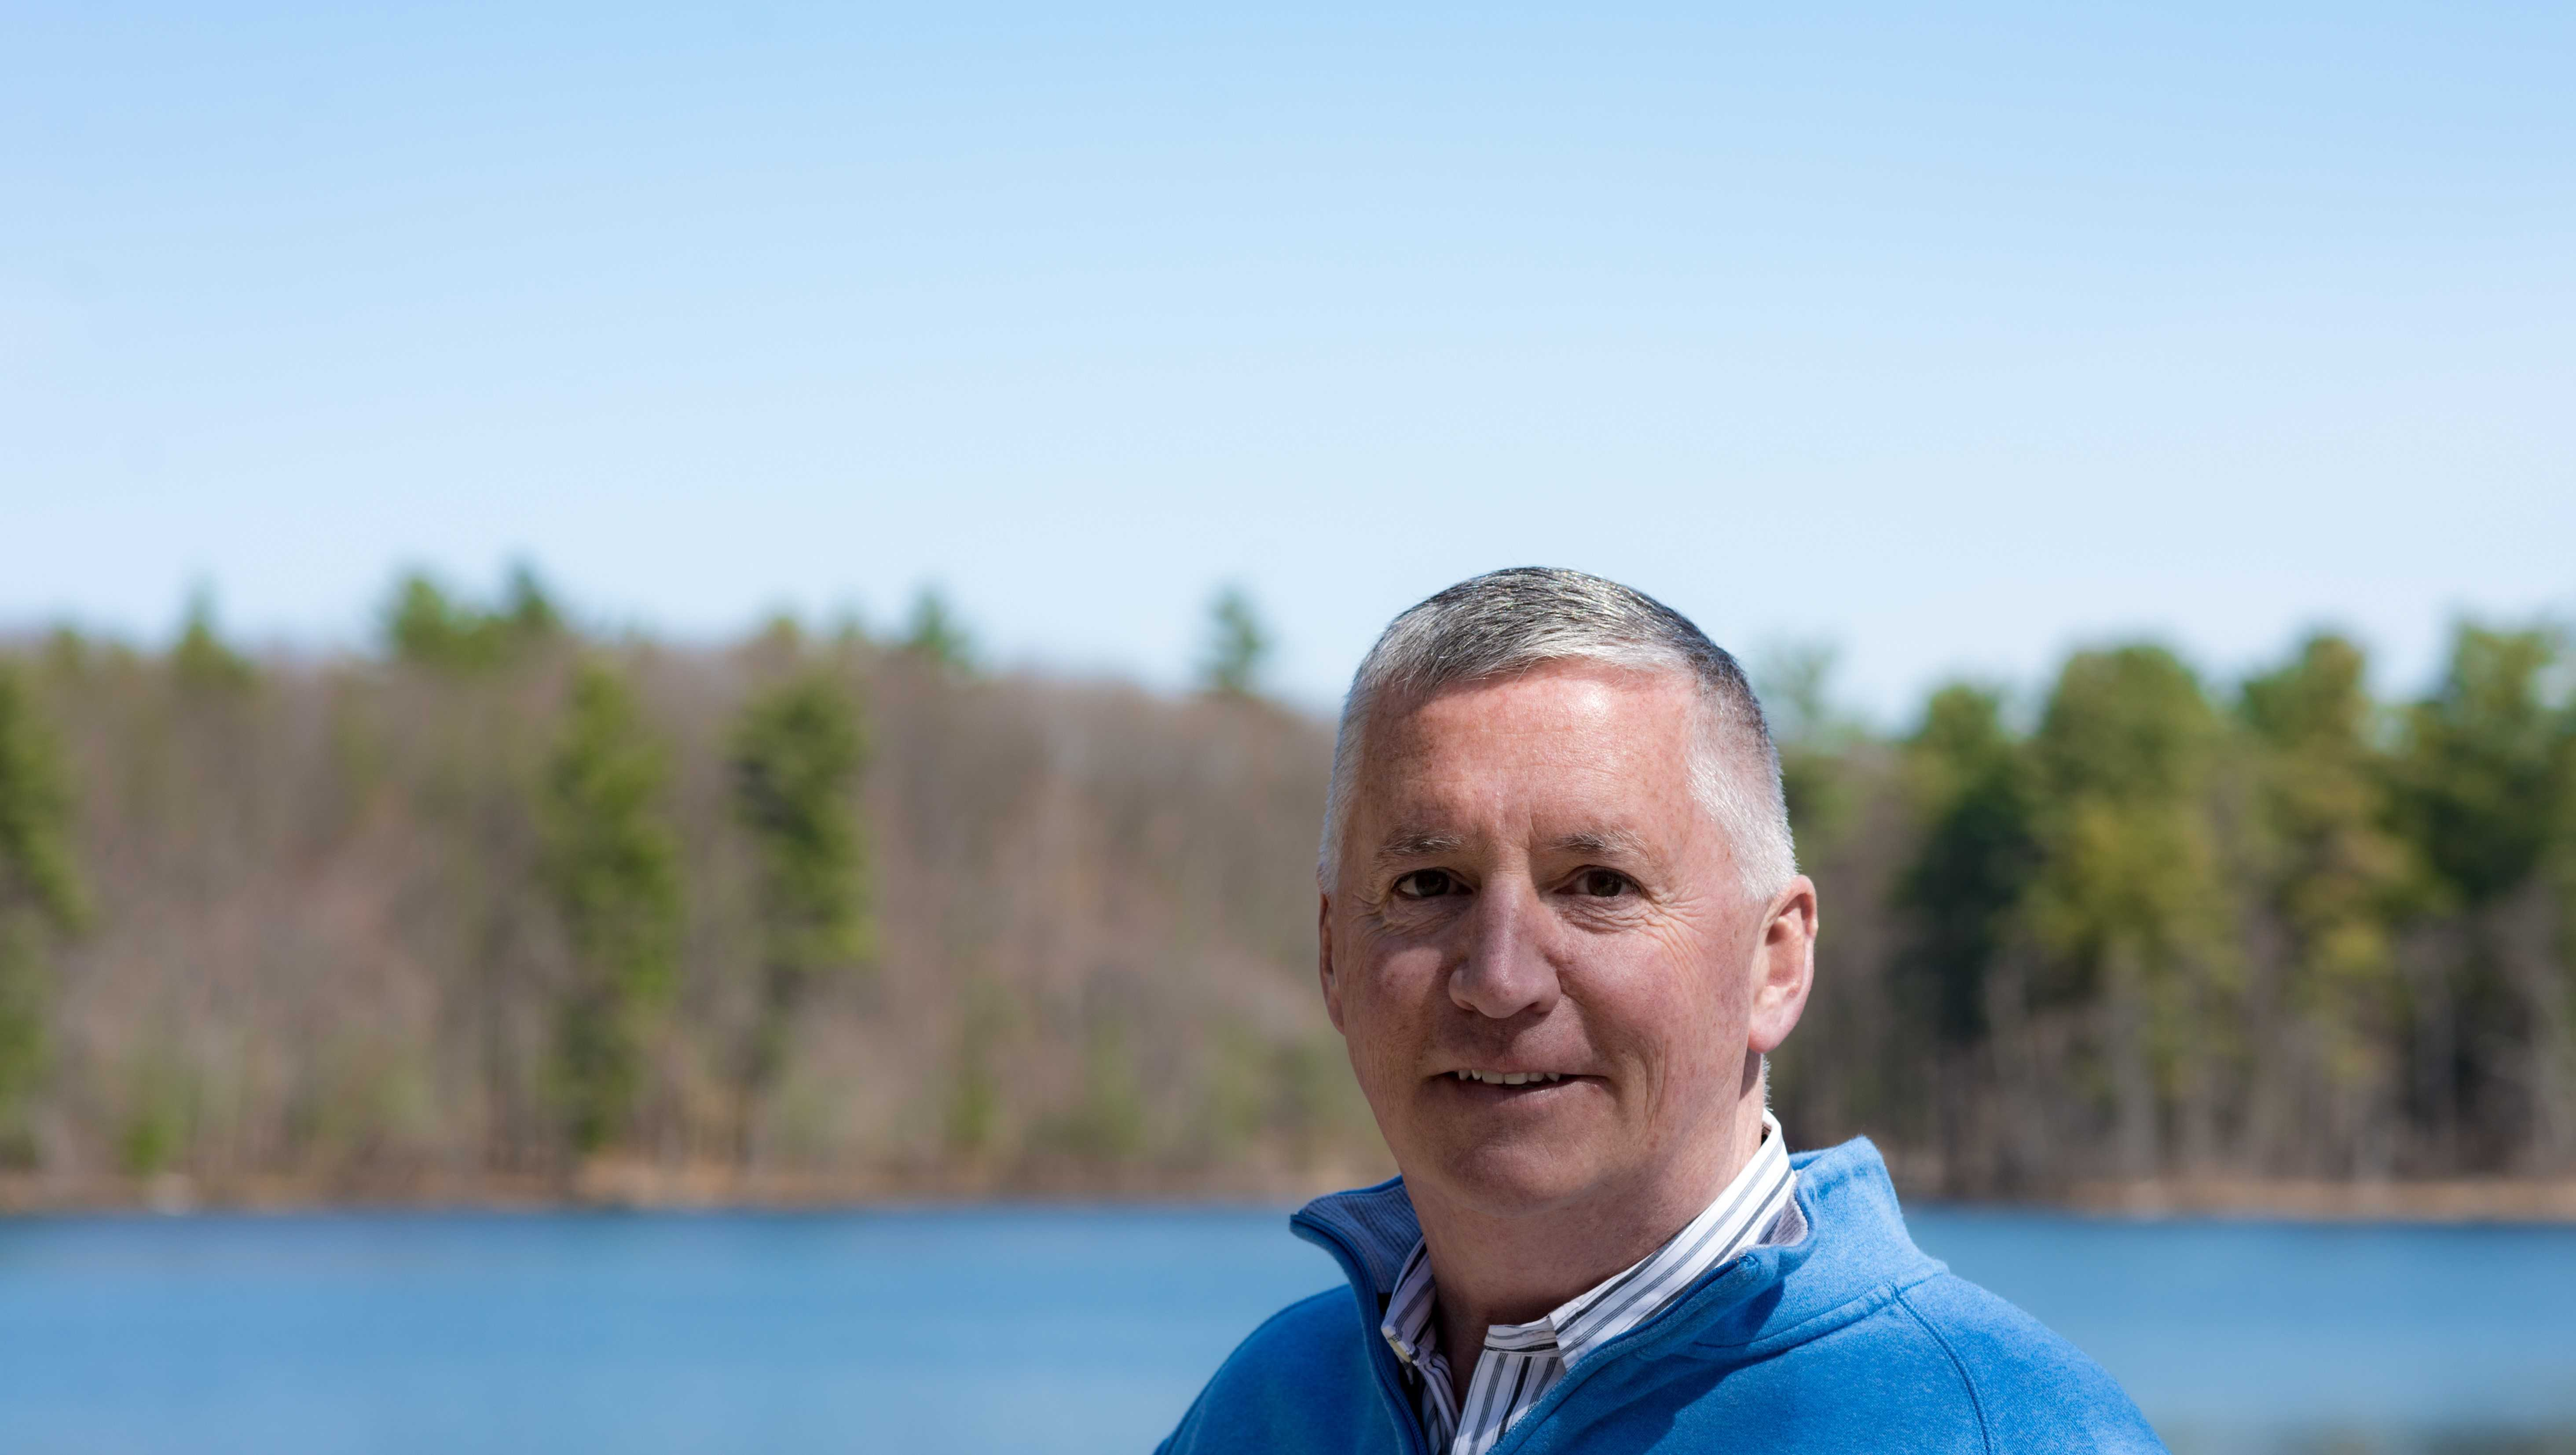 Manchester Ward 1 Alderman and District 16 state Senate candidate Kevin Cavanaugh